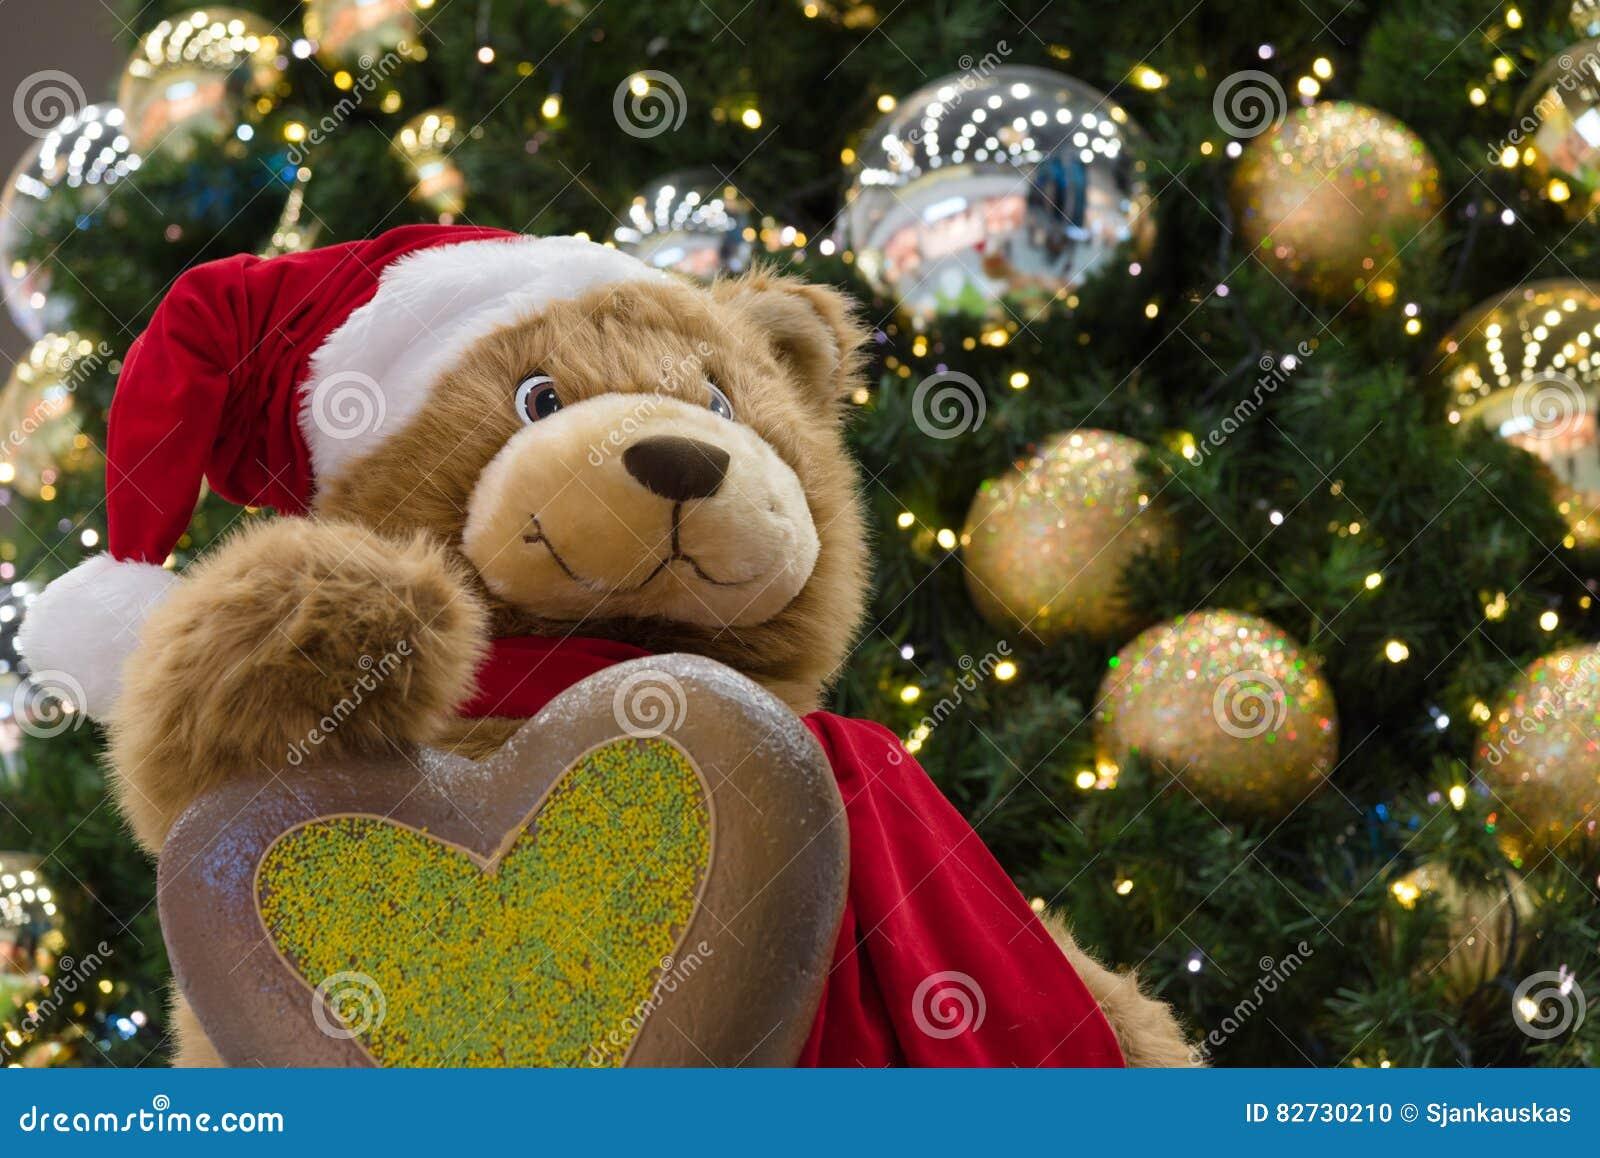 1dede54da5 Christmas Teddy Bear Seasonal Greetings Stock Photo - Image of ...